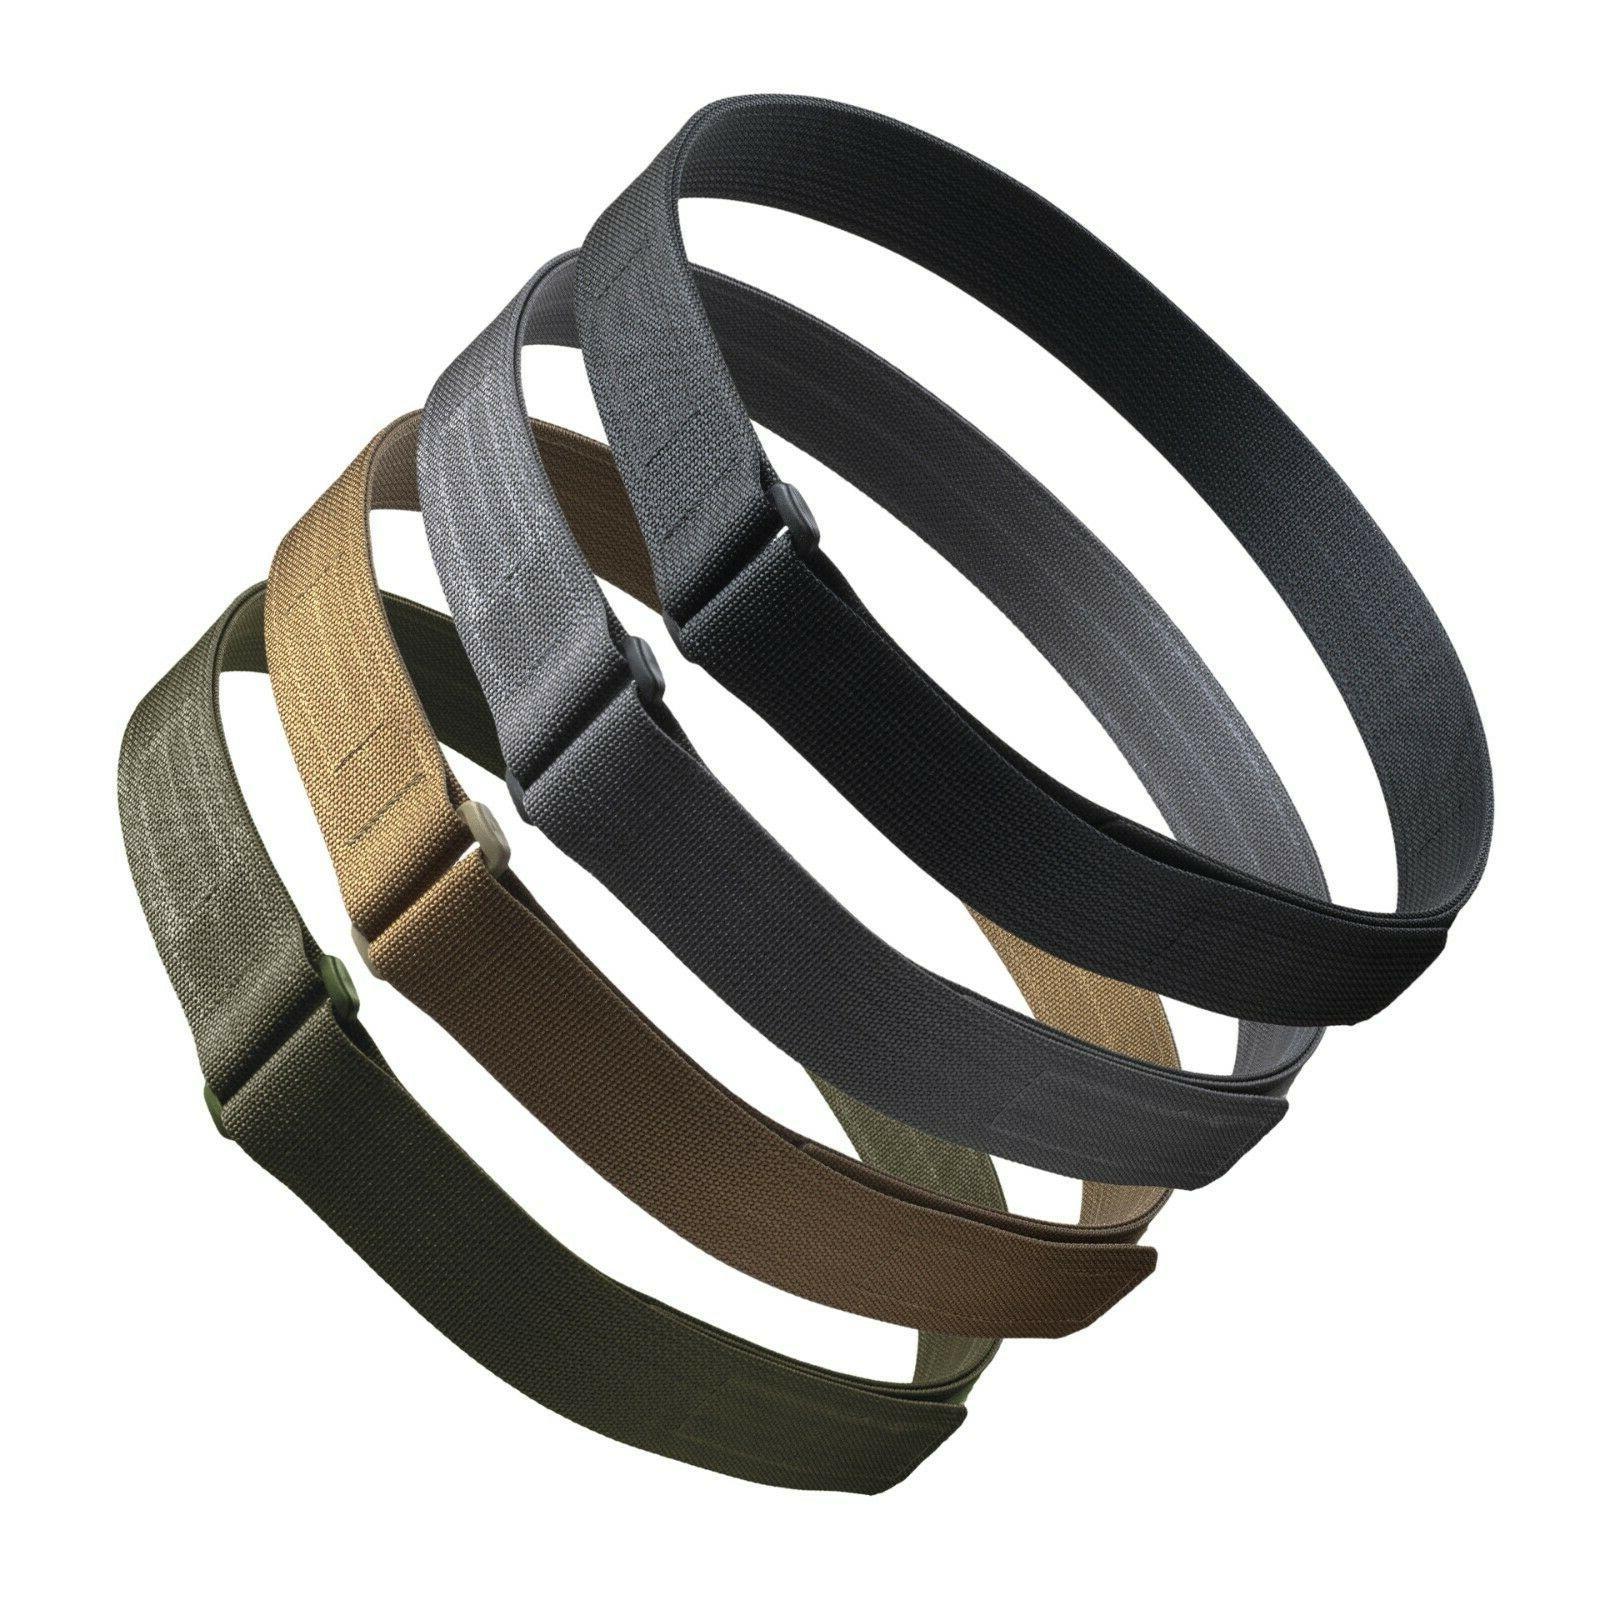 1 5 low profile edc belt